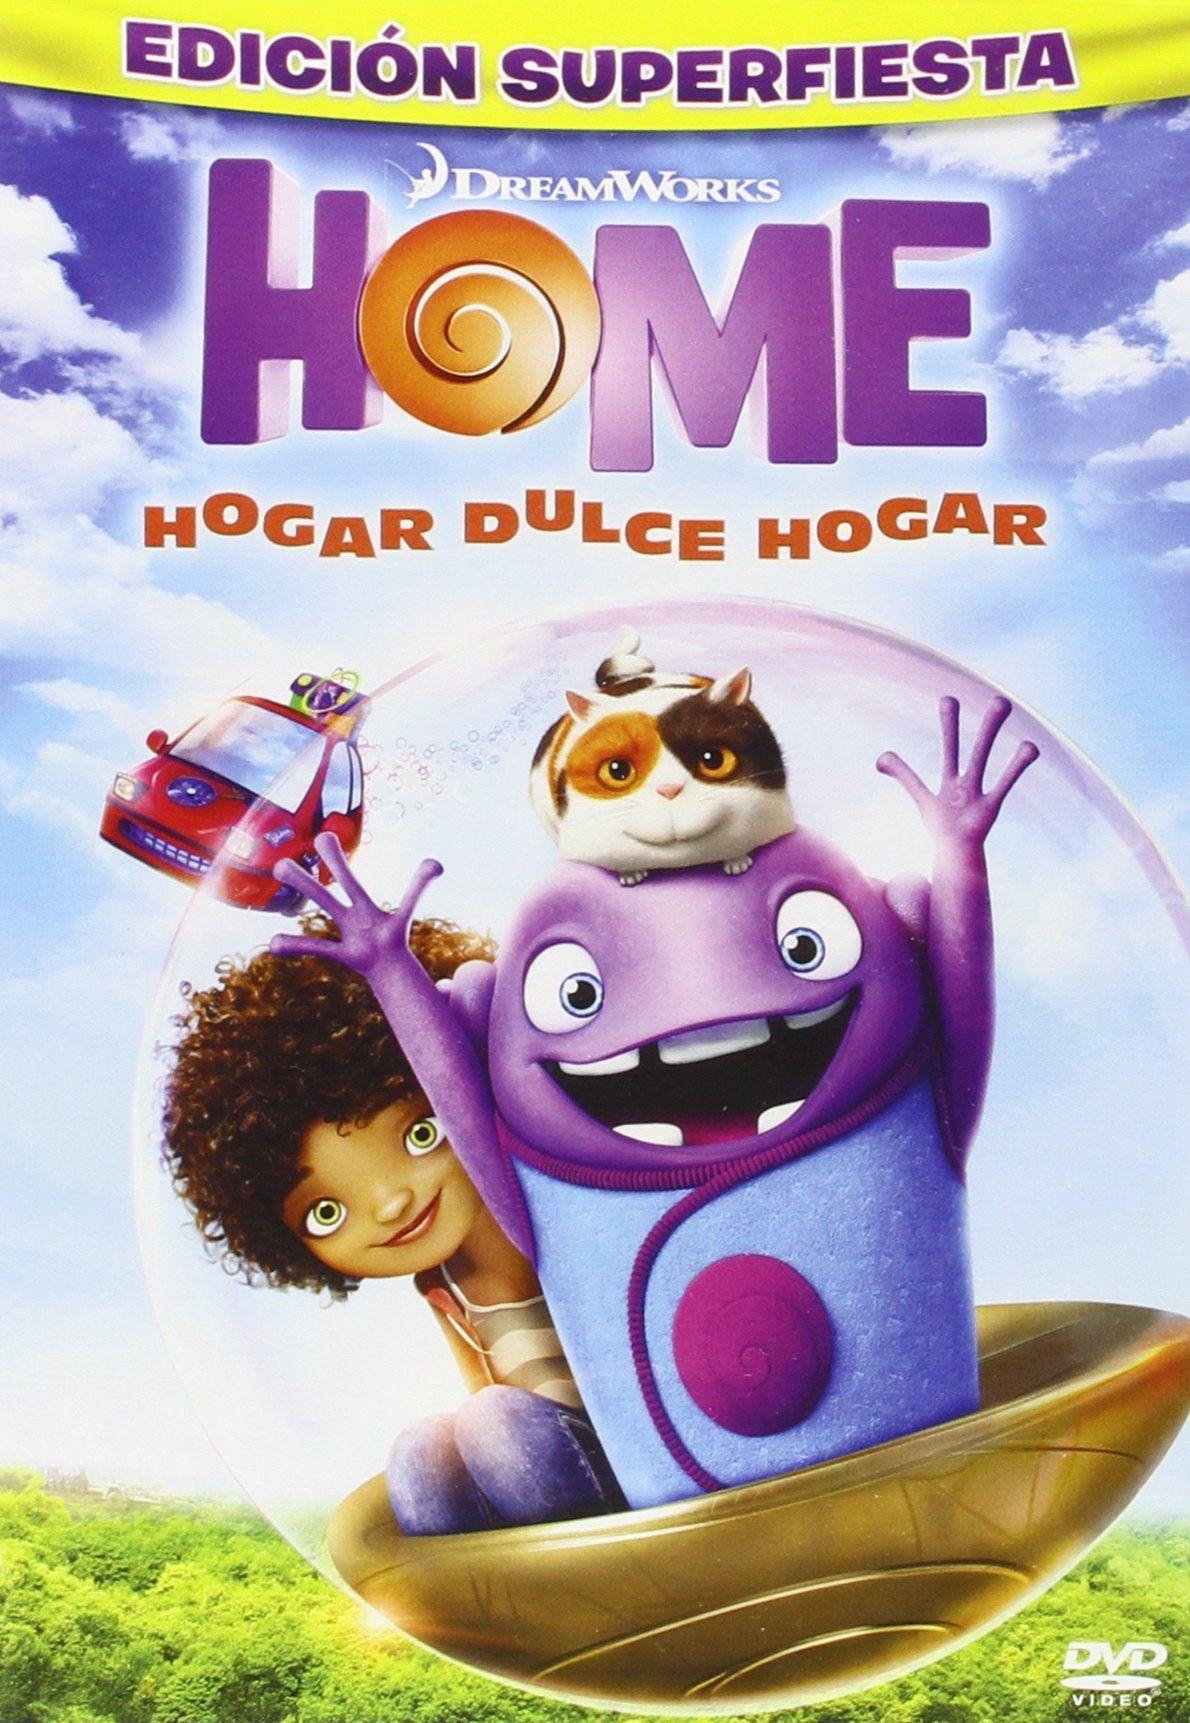 Home Hogar Dulce Hogar Dvd Ad Hogar Home Dvd Dulce